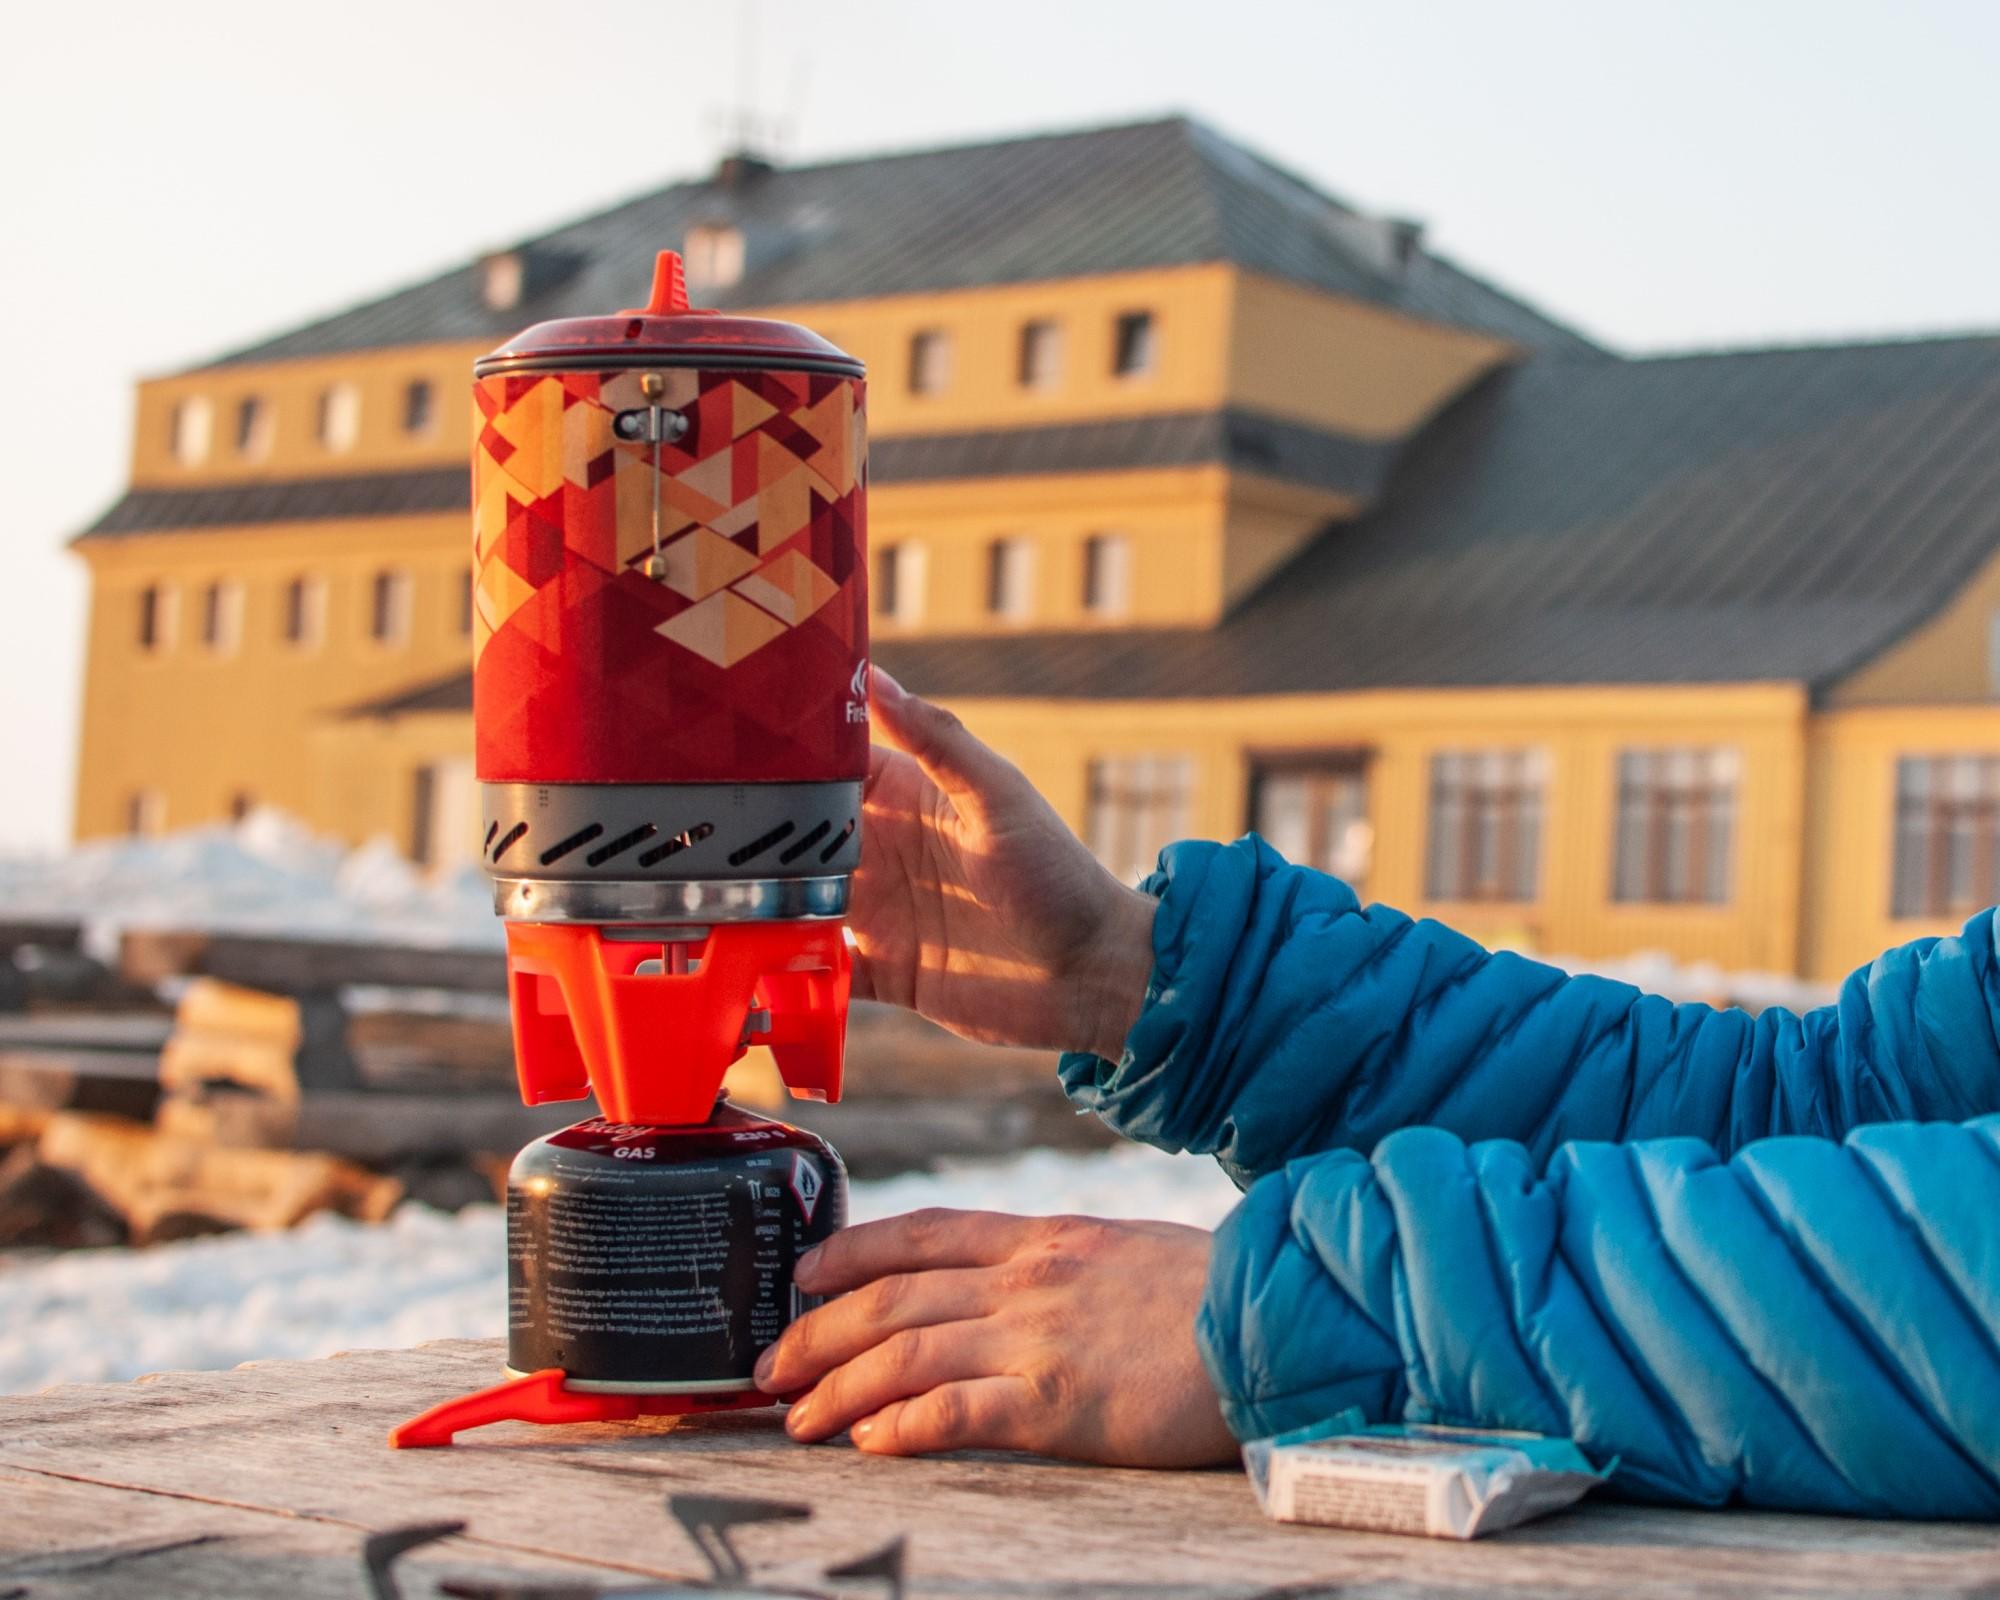 Kartusz gazowy na zimę fot Mateusz Malinowski